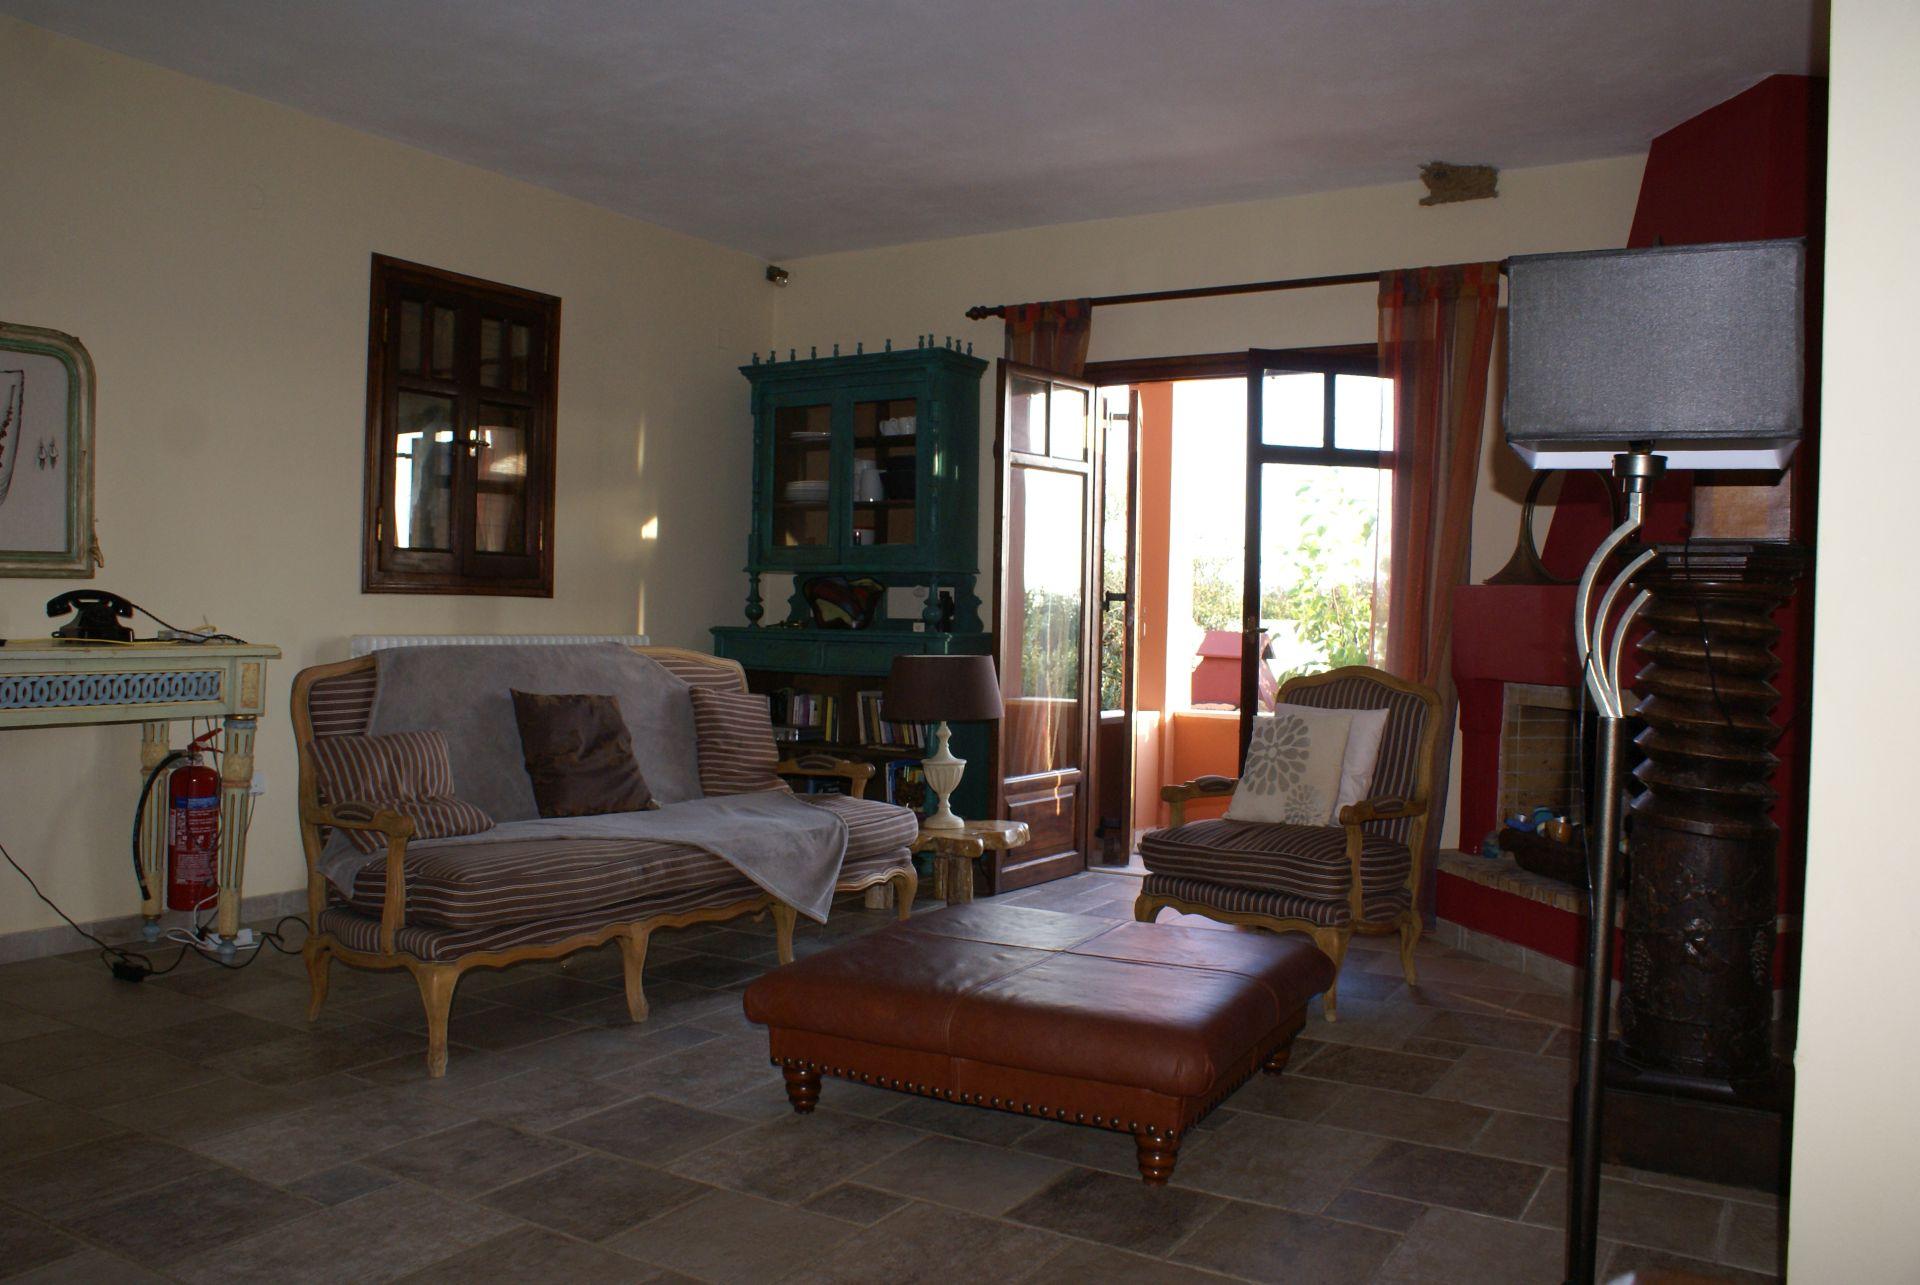 Wohnzimmer - Korfu Strandvilla Meliti, Kanouli, Agios Matheos, Korfu, KorfuCorfu